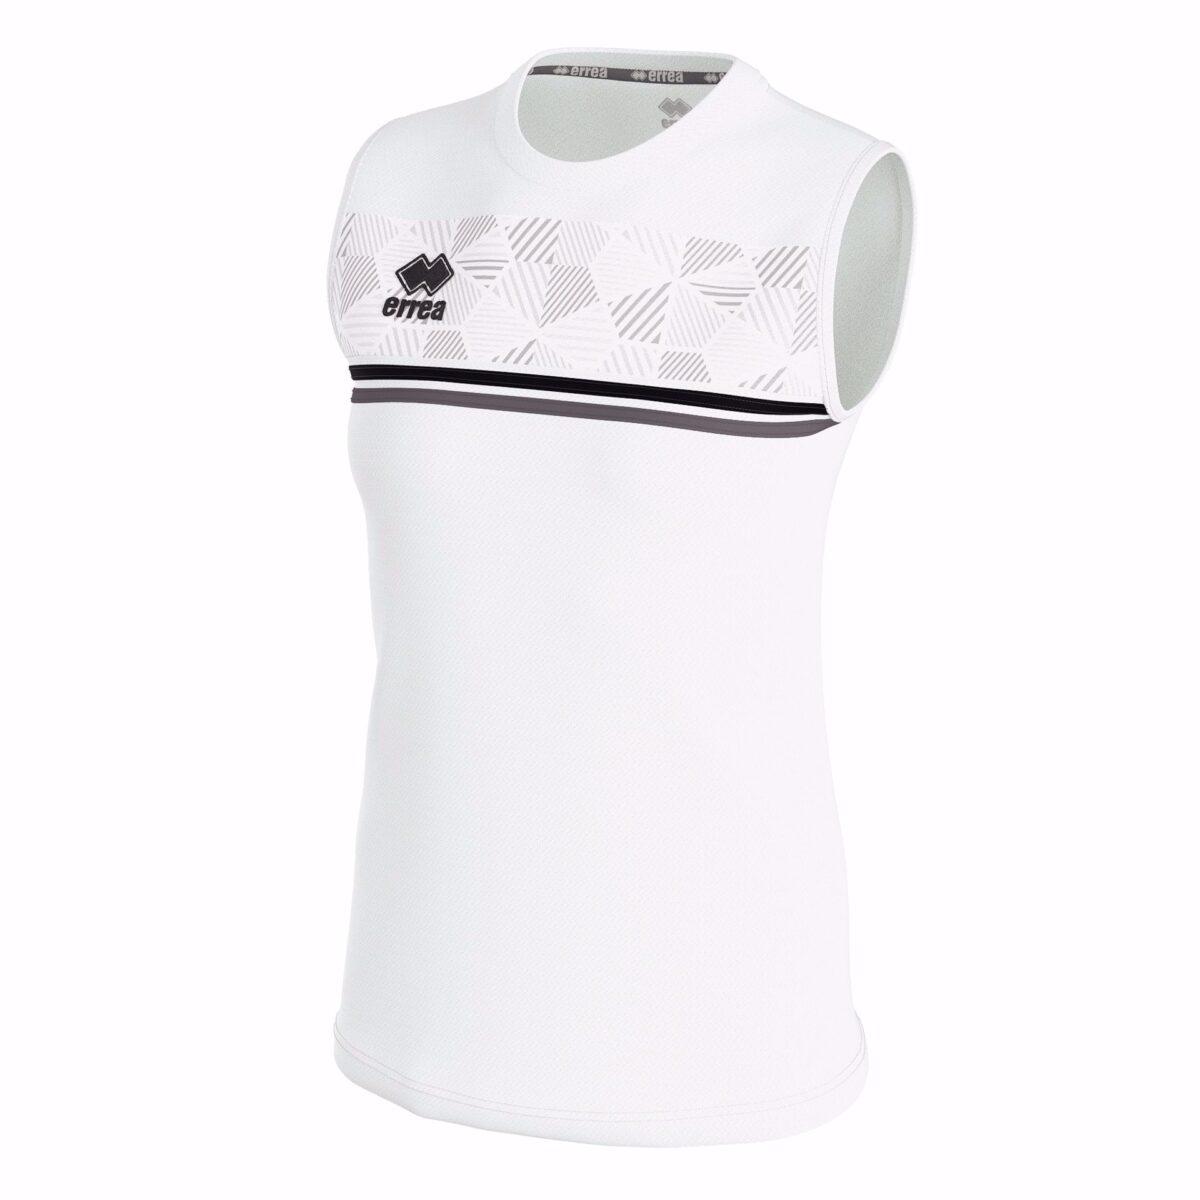 Errea Divina Womens Short Sleeve Adult Shirt - FM880S